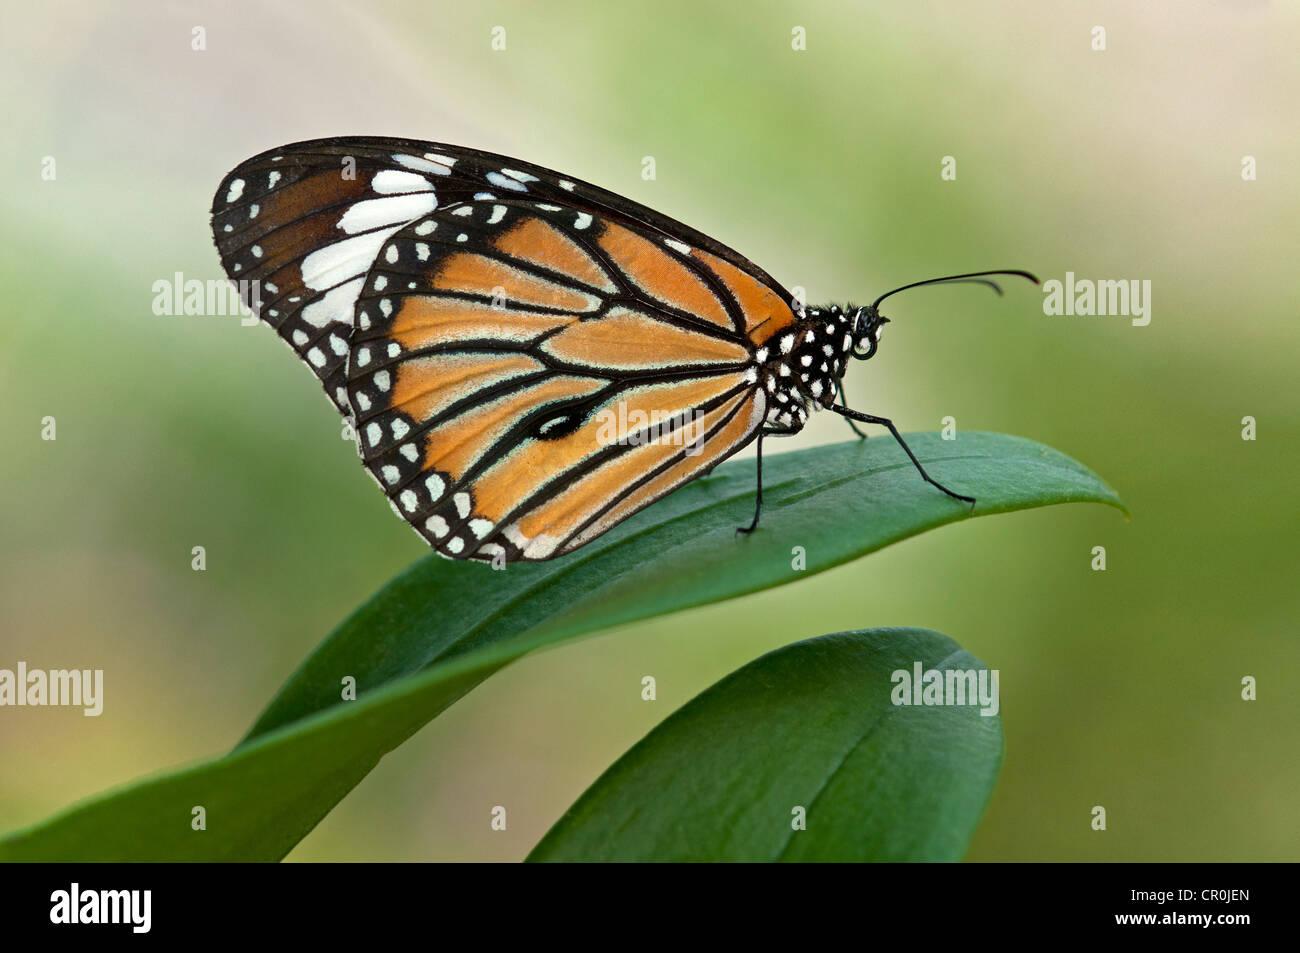 Monarch Butterfly (Danaus plexippus), Phuket, Thailand, Asia - Stock Image